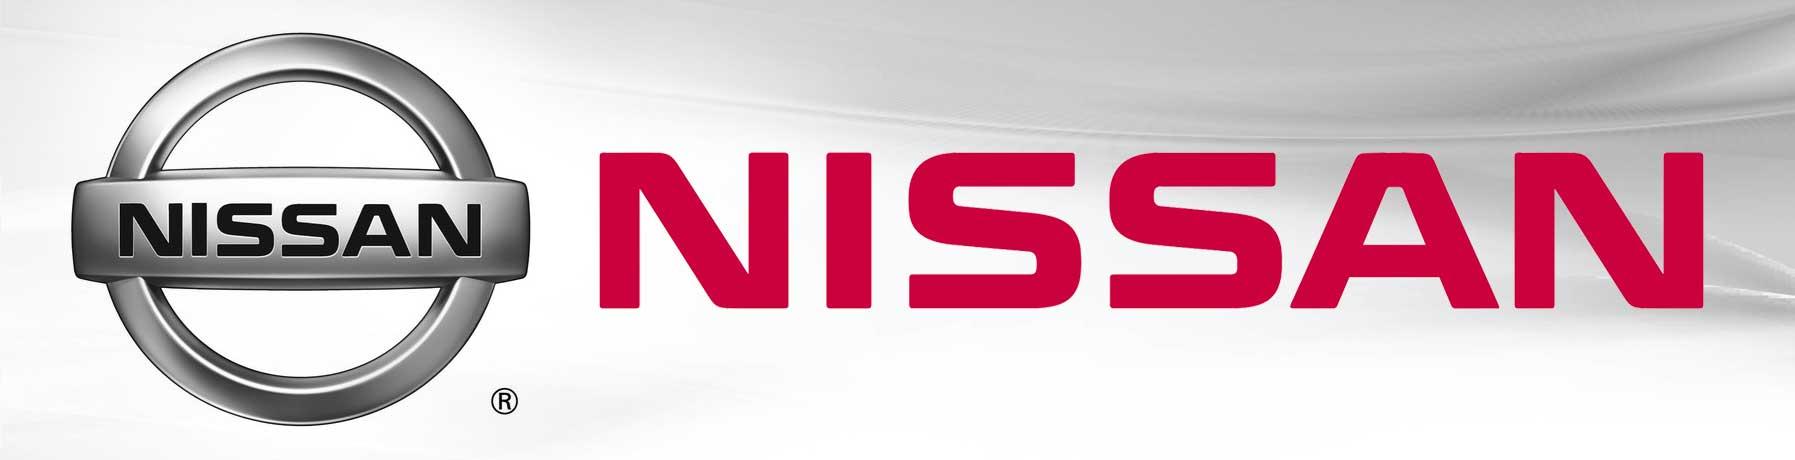 Nissan - Mercie J Auto Care in Mesa, AZ